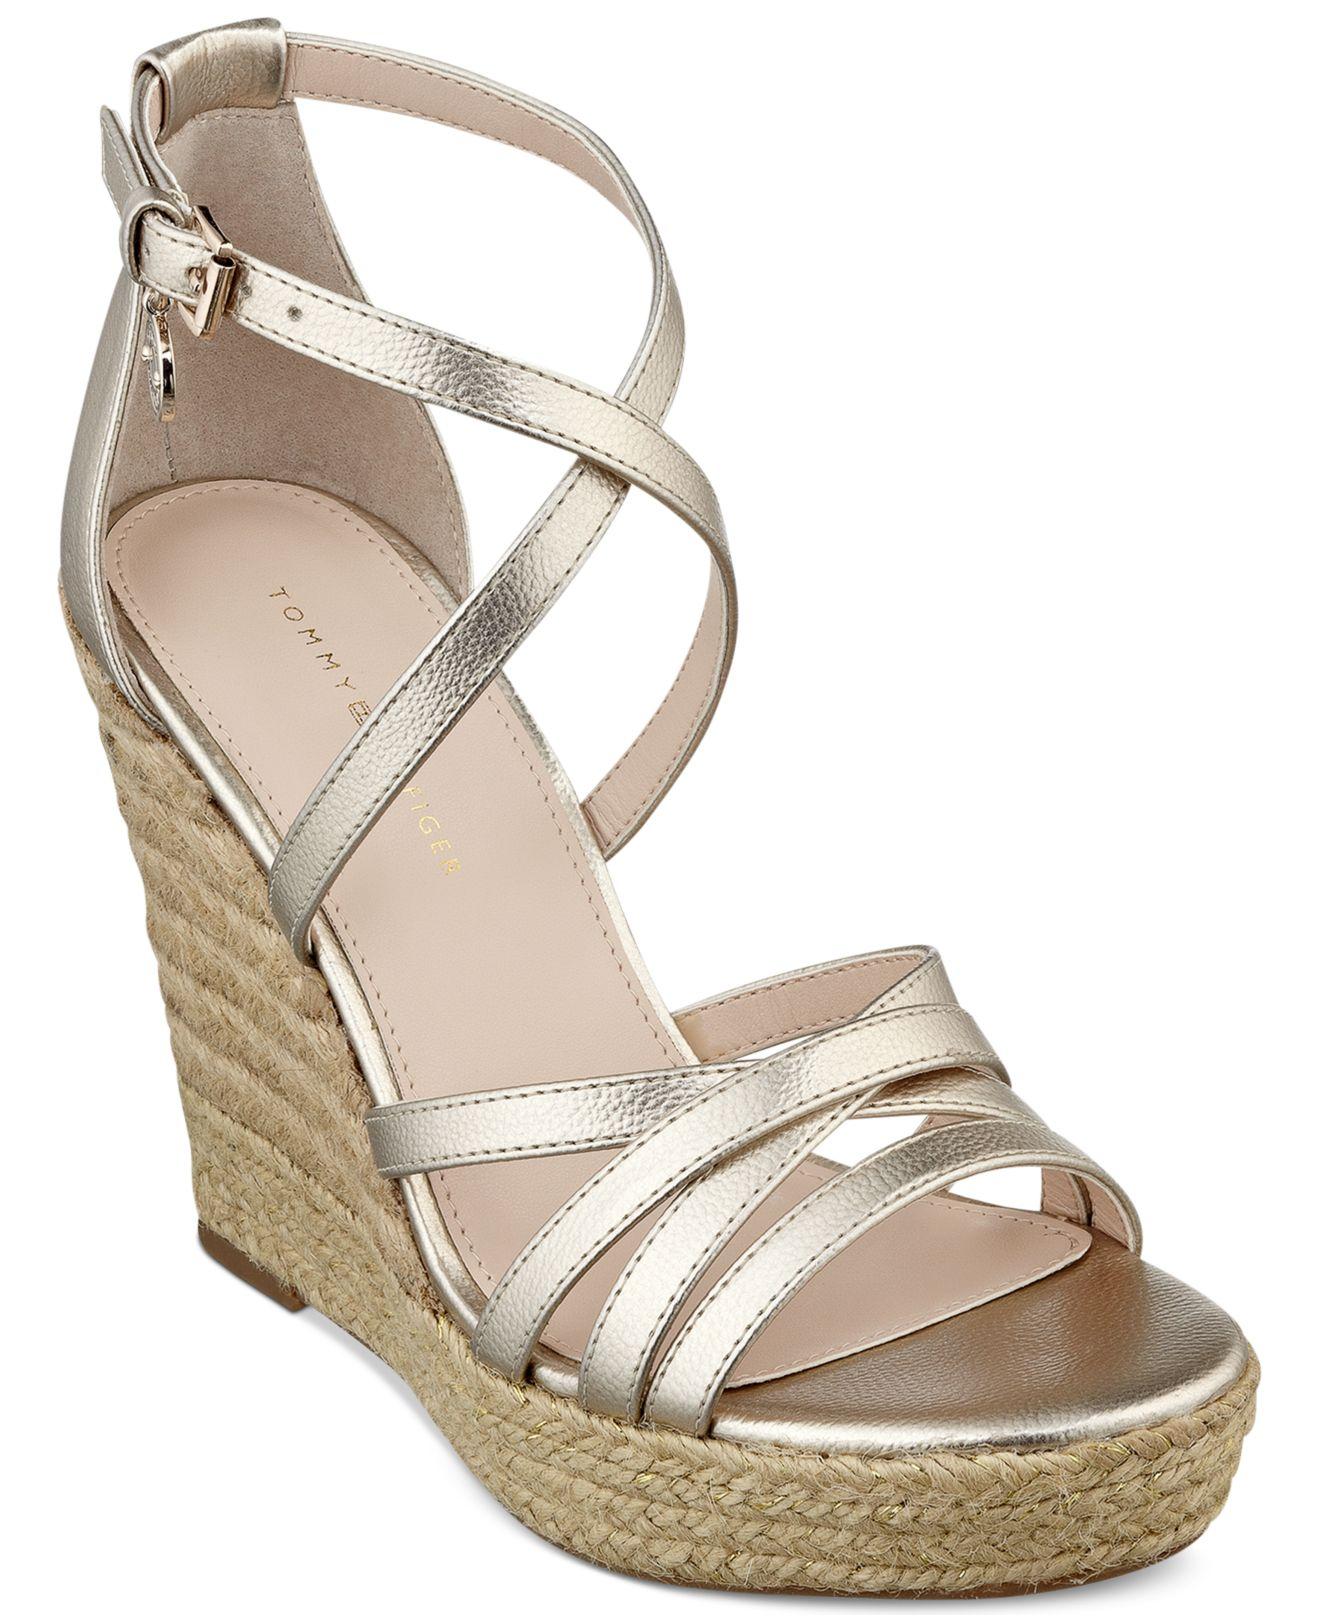 5f2cbeba23f Lyst - Tommy Hilfiger Women S Venitia Platform Wedge Sandals in Metallic